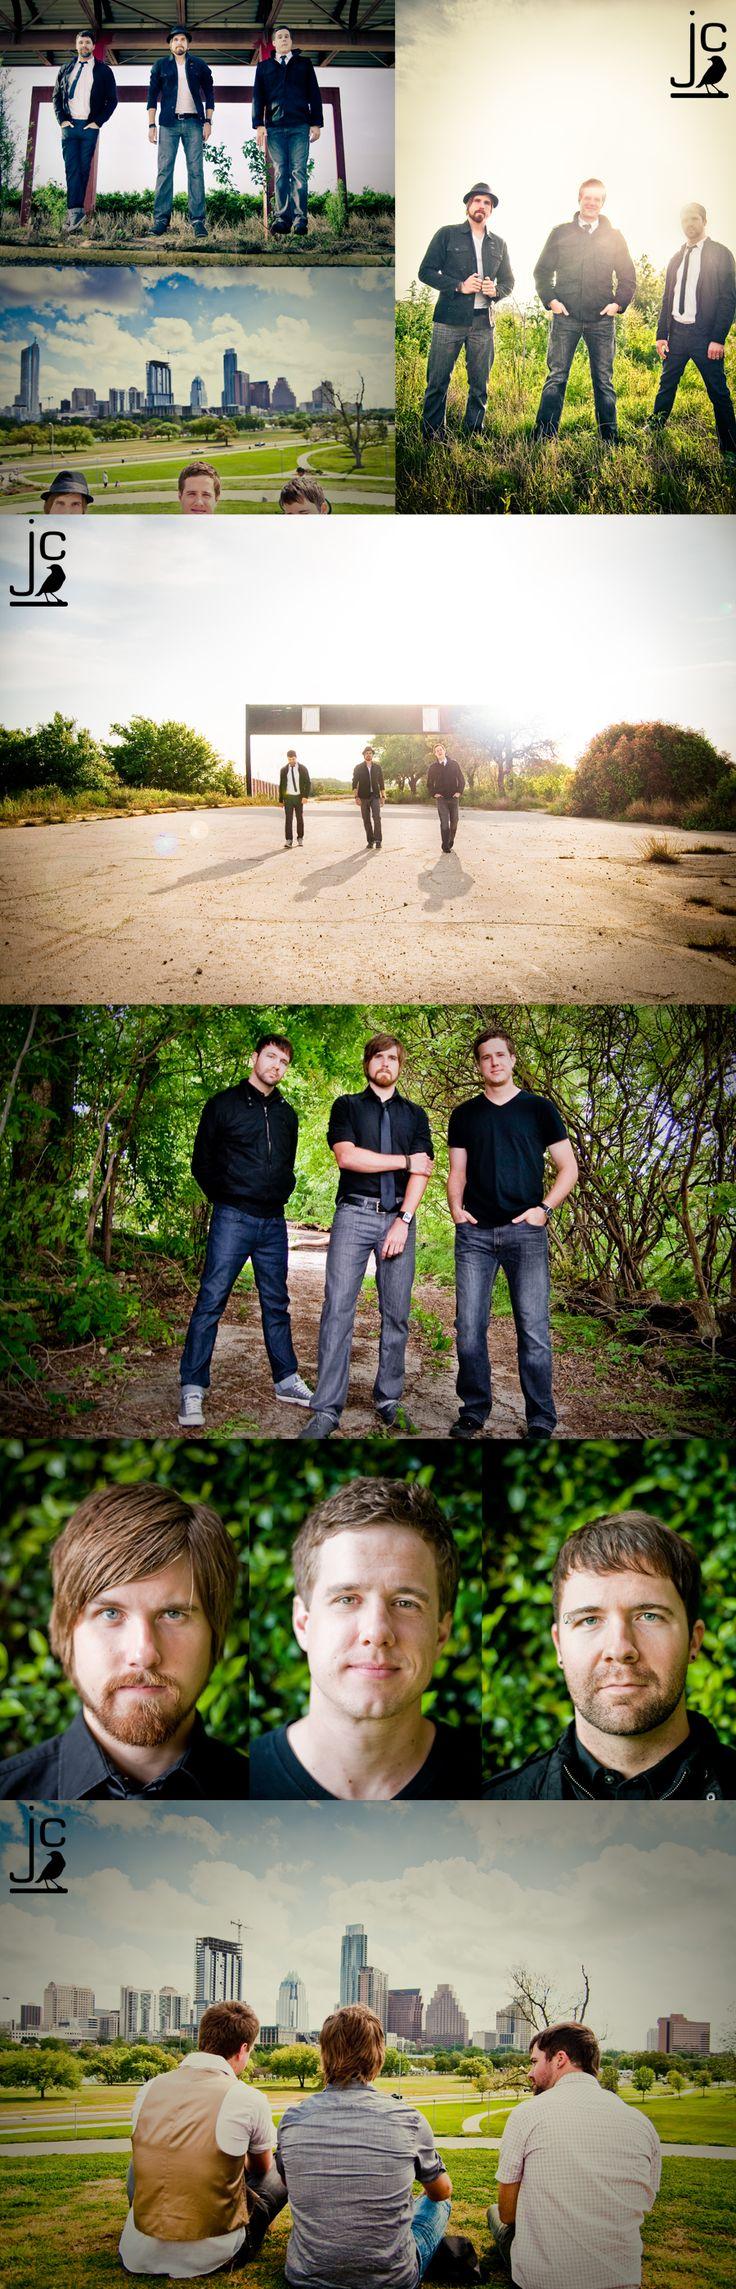 copyright Jennifer Crane Photography (www.jennifercranephotography.com)        The Beautiful Fools, band photography ... Hope I can become good enough to have a band photoshoot!